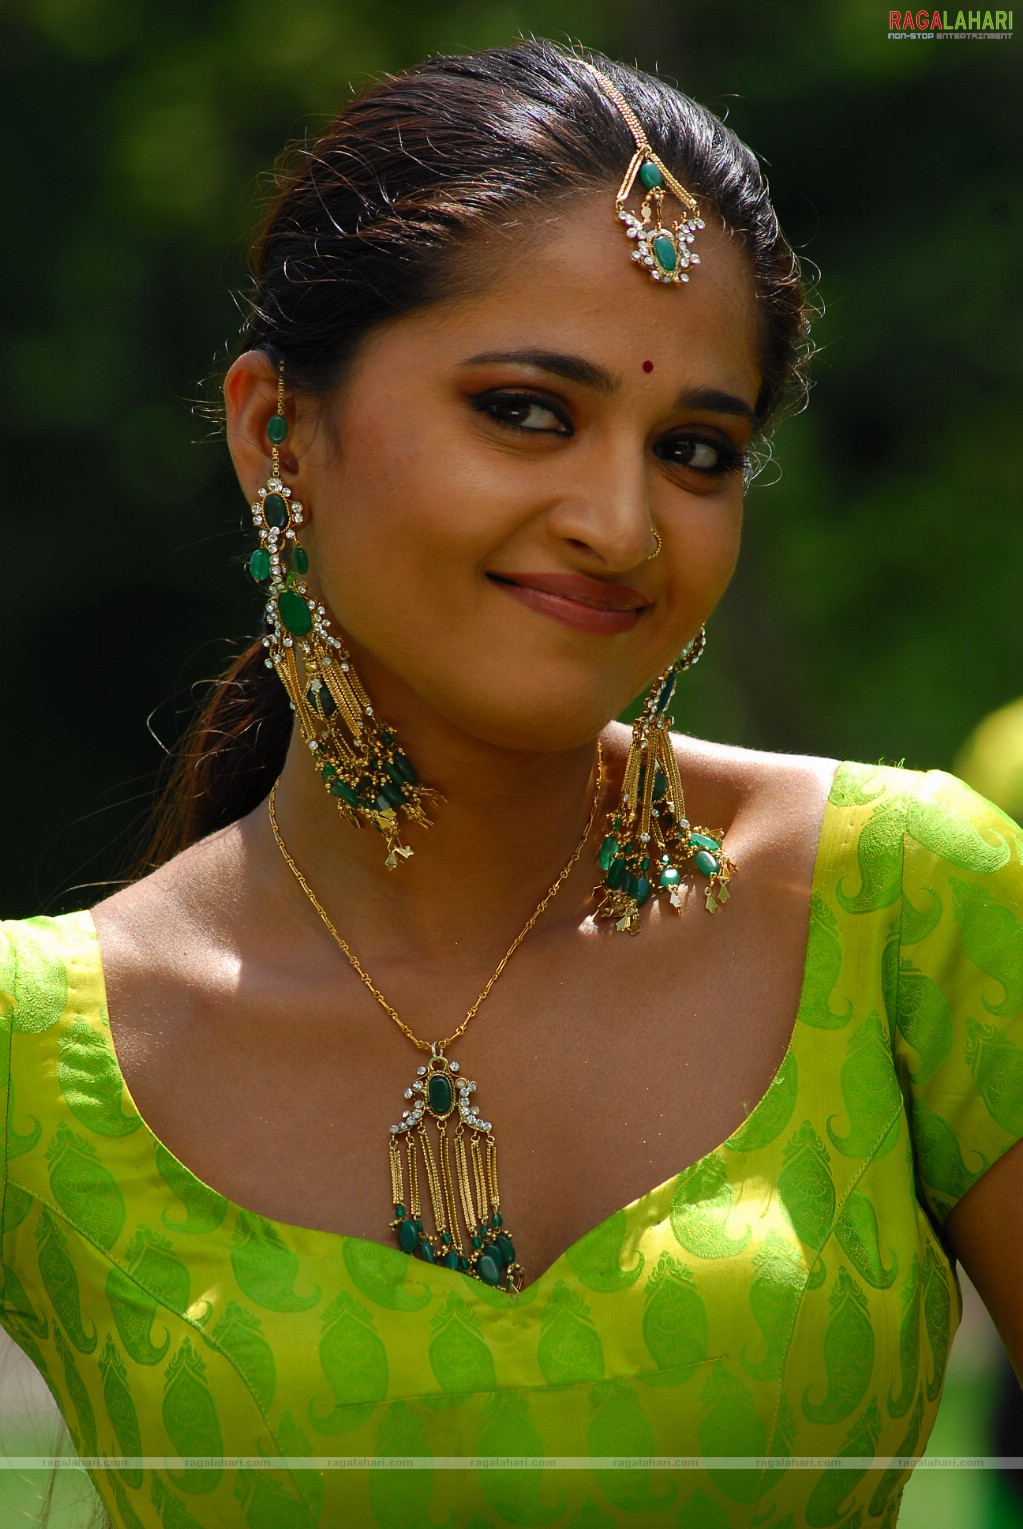 Telugu dating